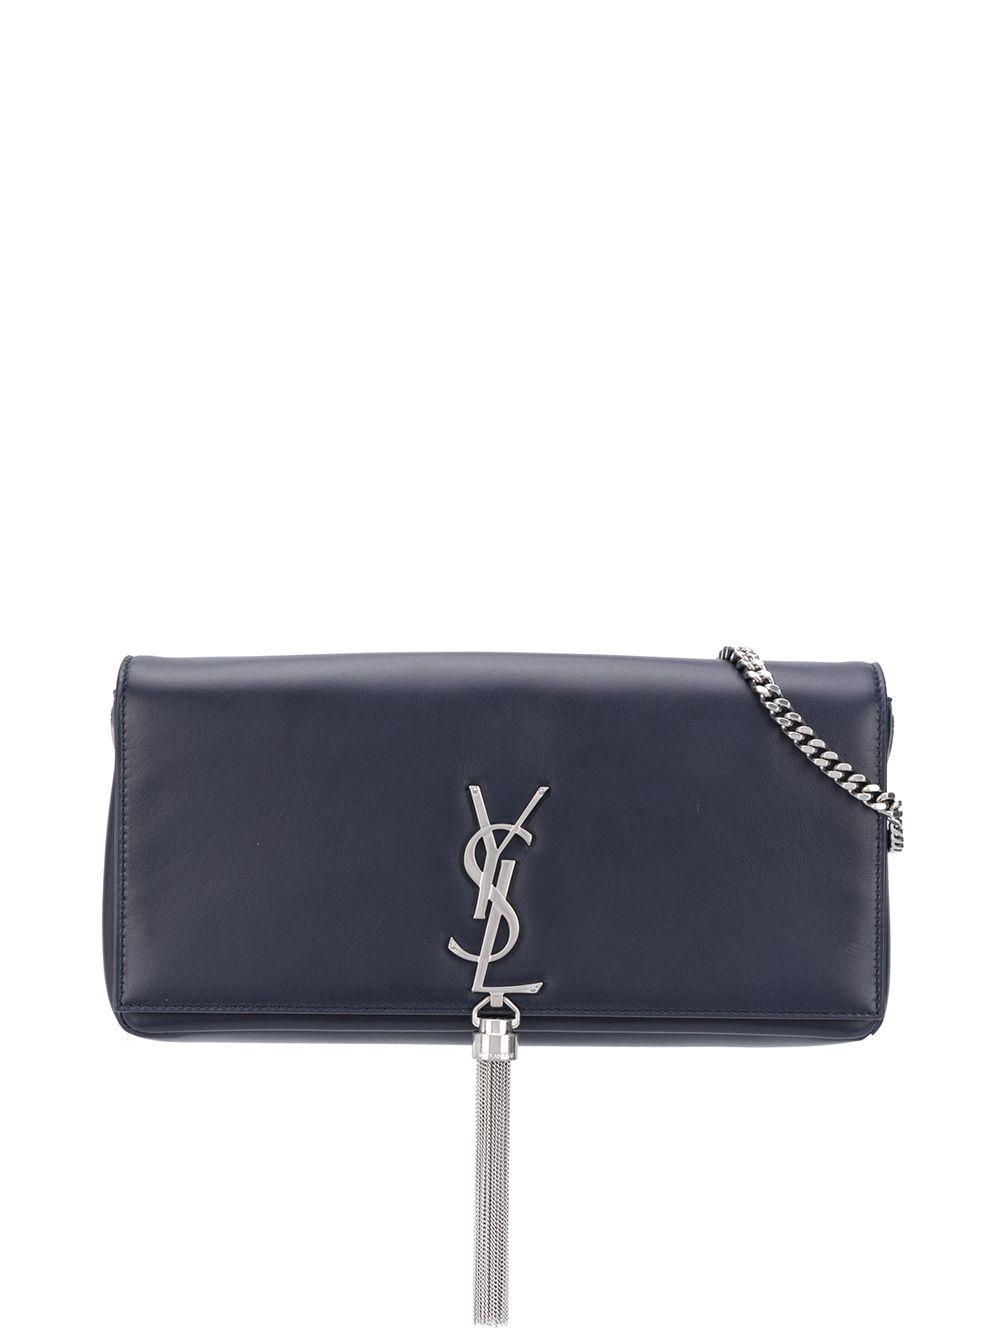 Kate Monogram Shoulder Bag Item # 6042761EL0E